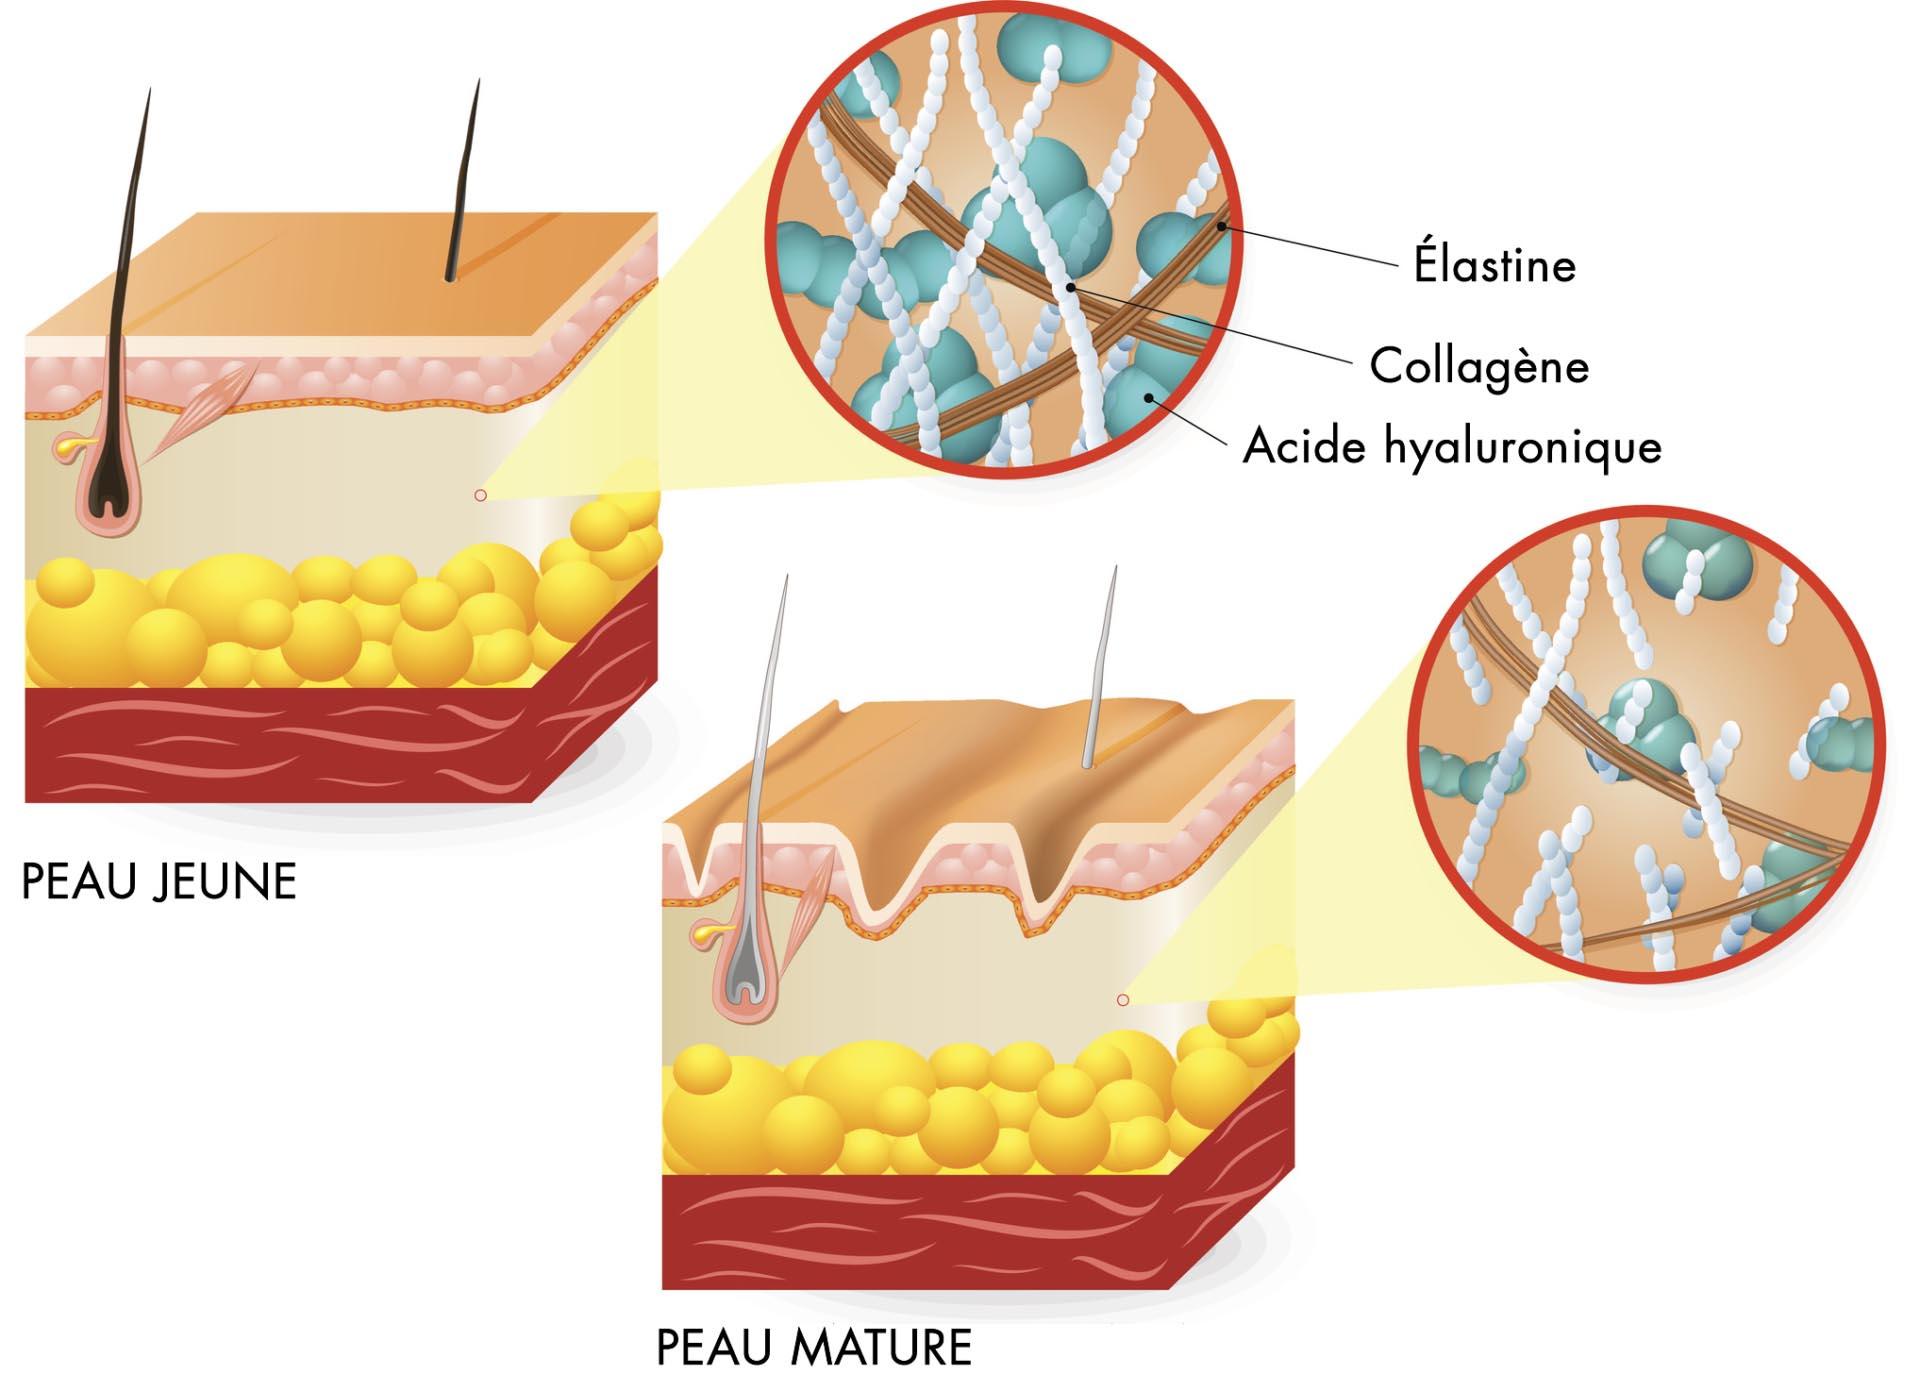 collagene acide hyaluronique